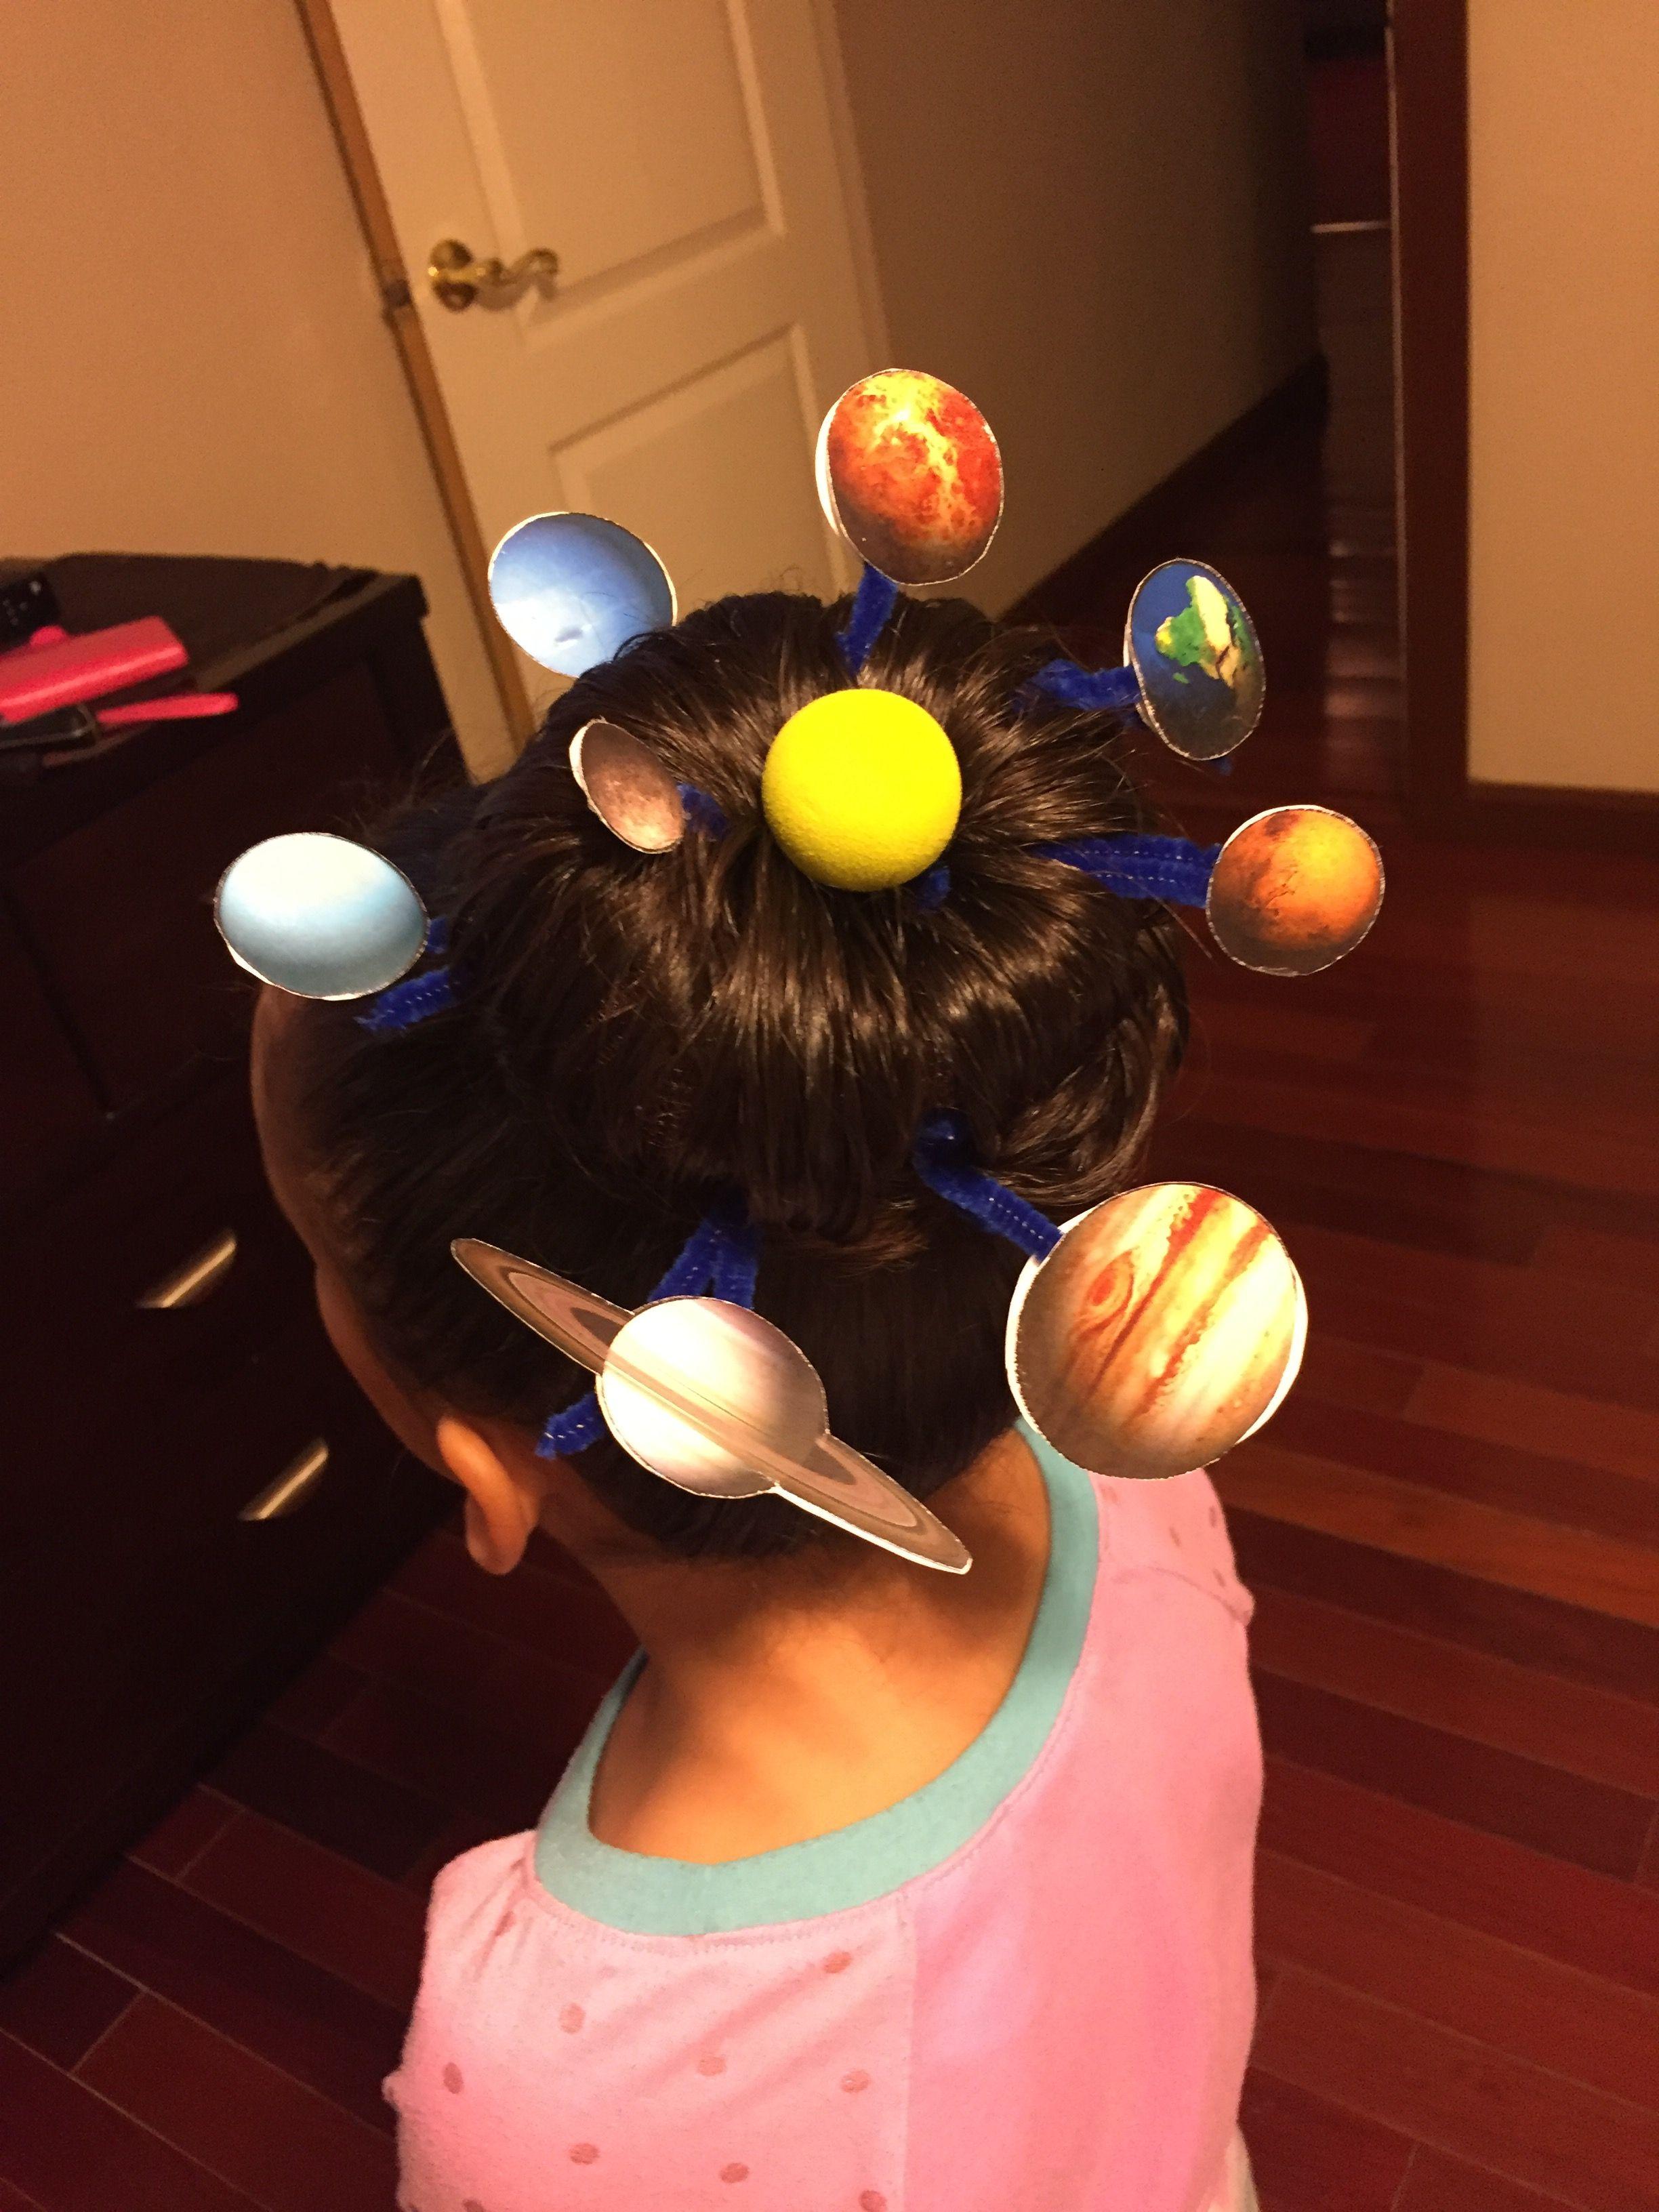 Formas modernas de peinados divertidos para niñas Fotos de estilo de color de pelo - Solar system themed crazy hair day for Drug Free week ...